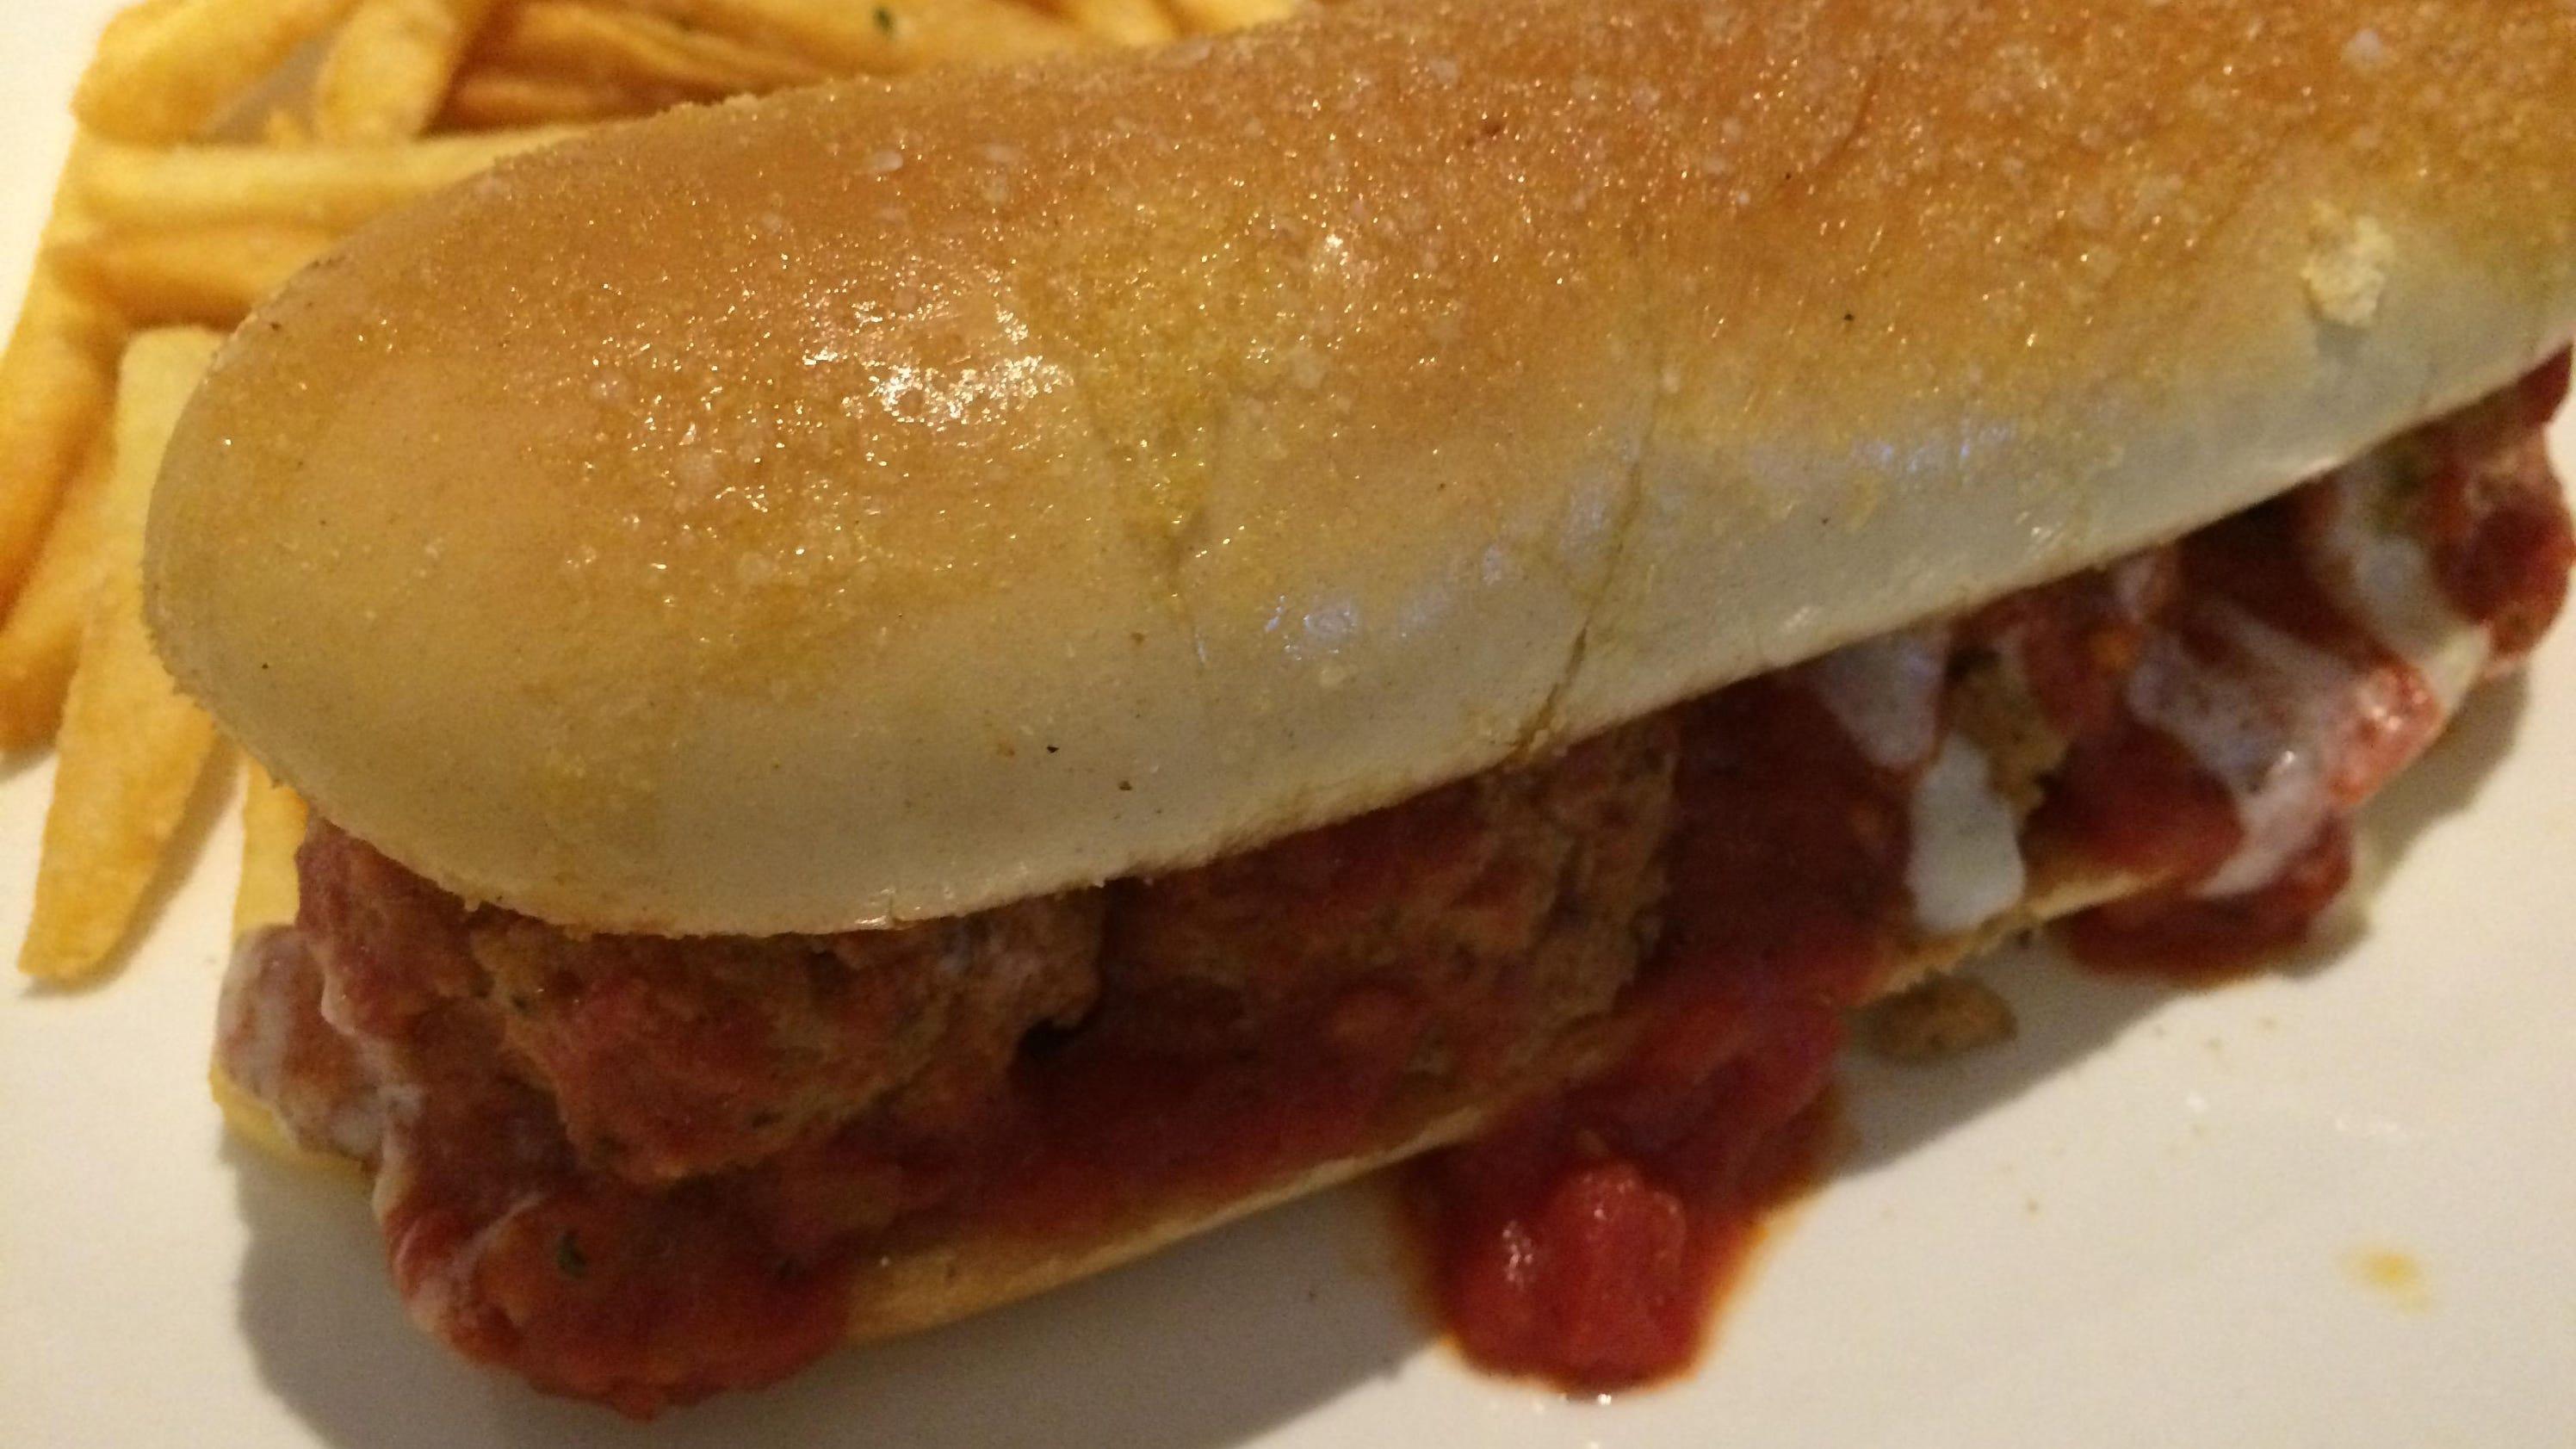 Jlb Rates Olive Garden 39 S Breadstick Sandwich In 3 Tweets